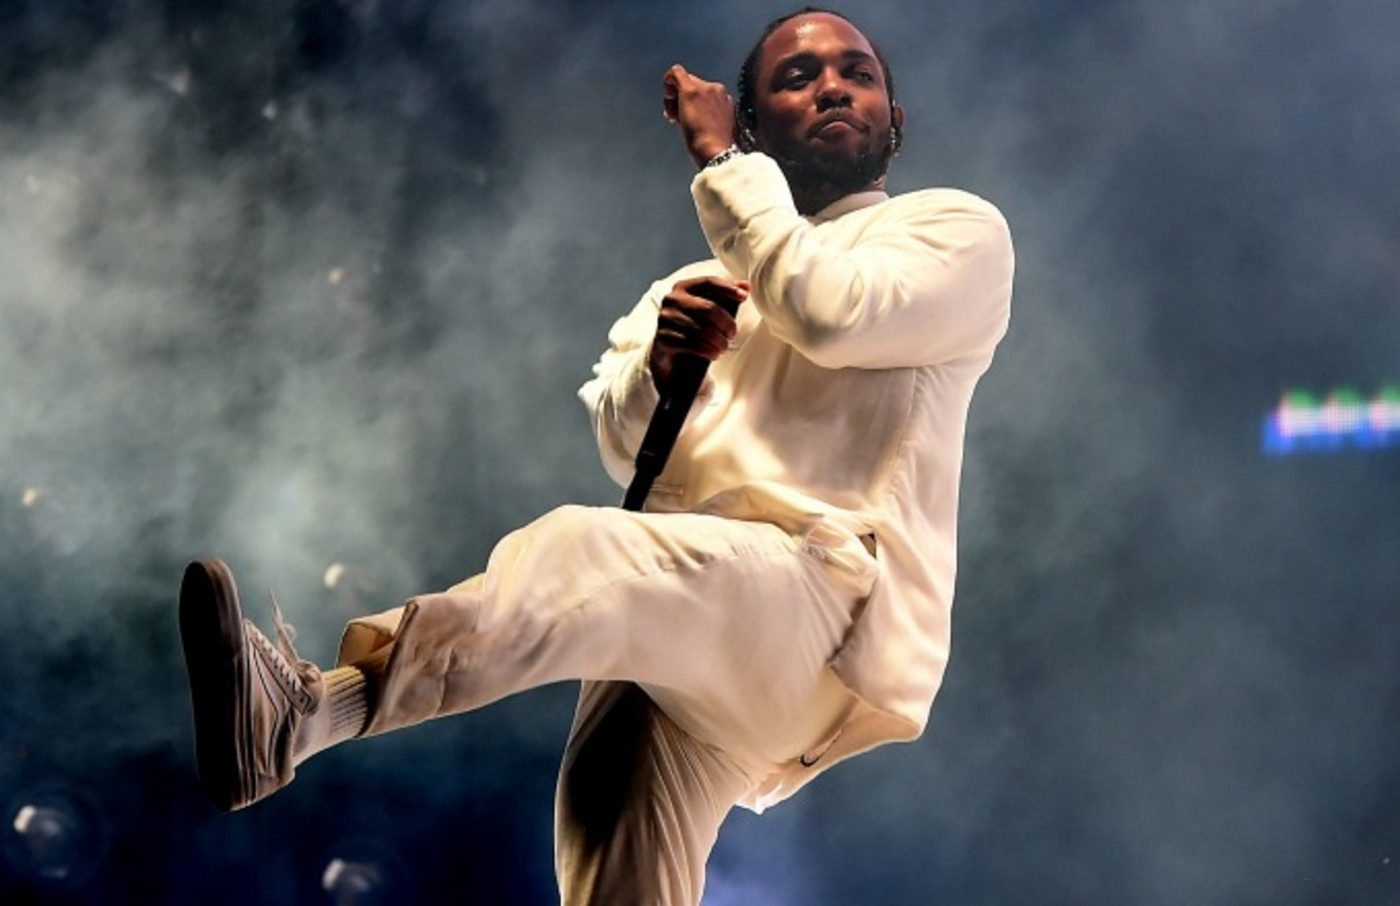 Kendrick Lamar performs at Coachella.